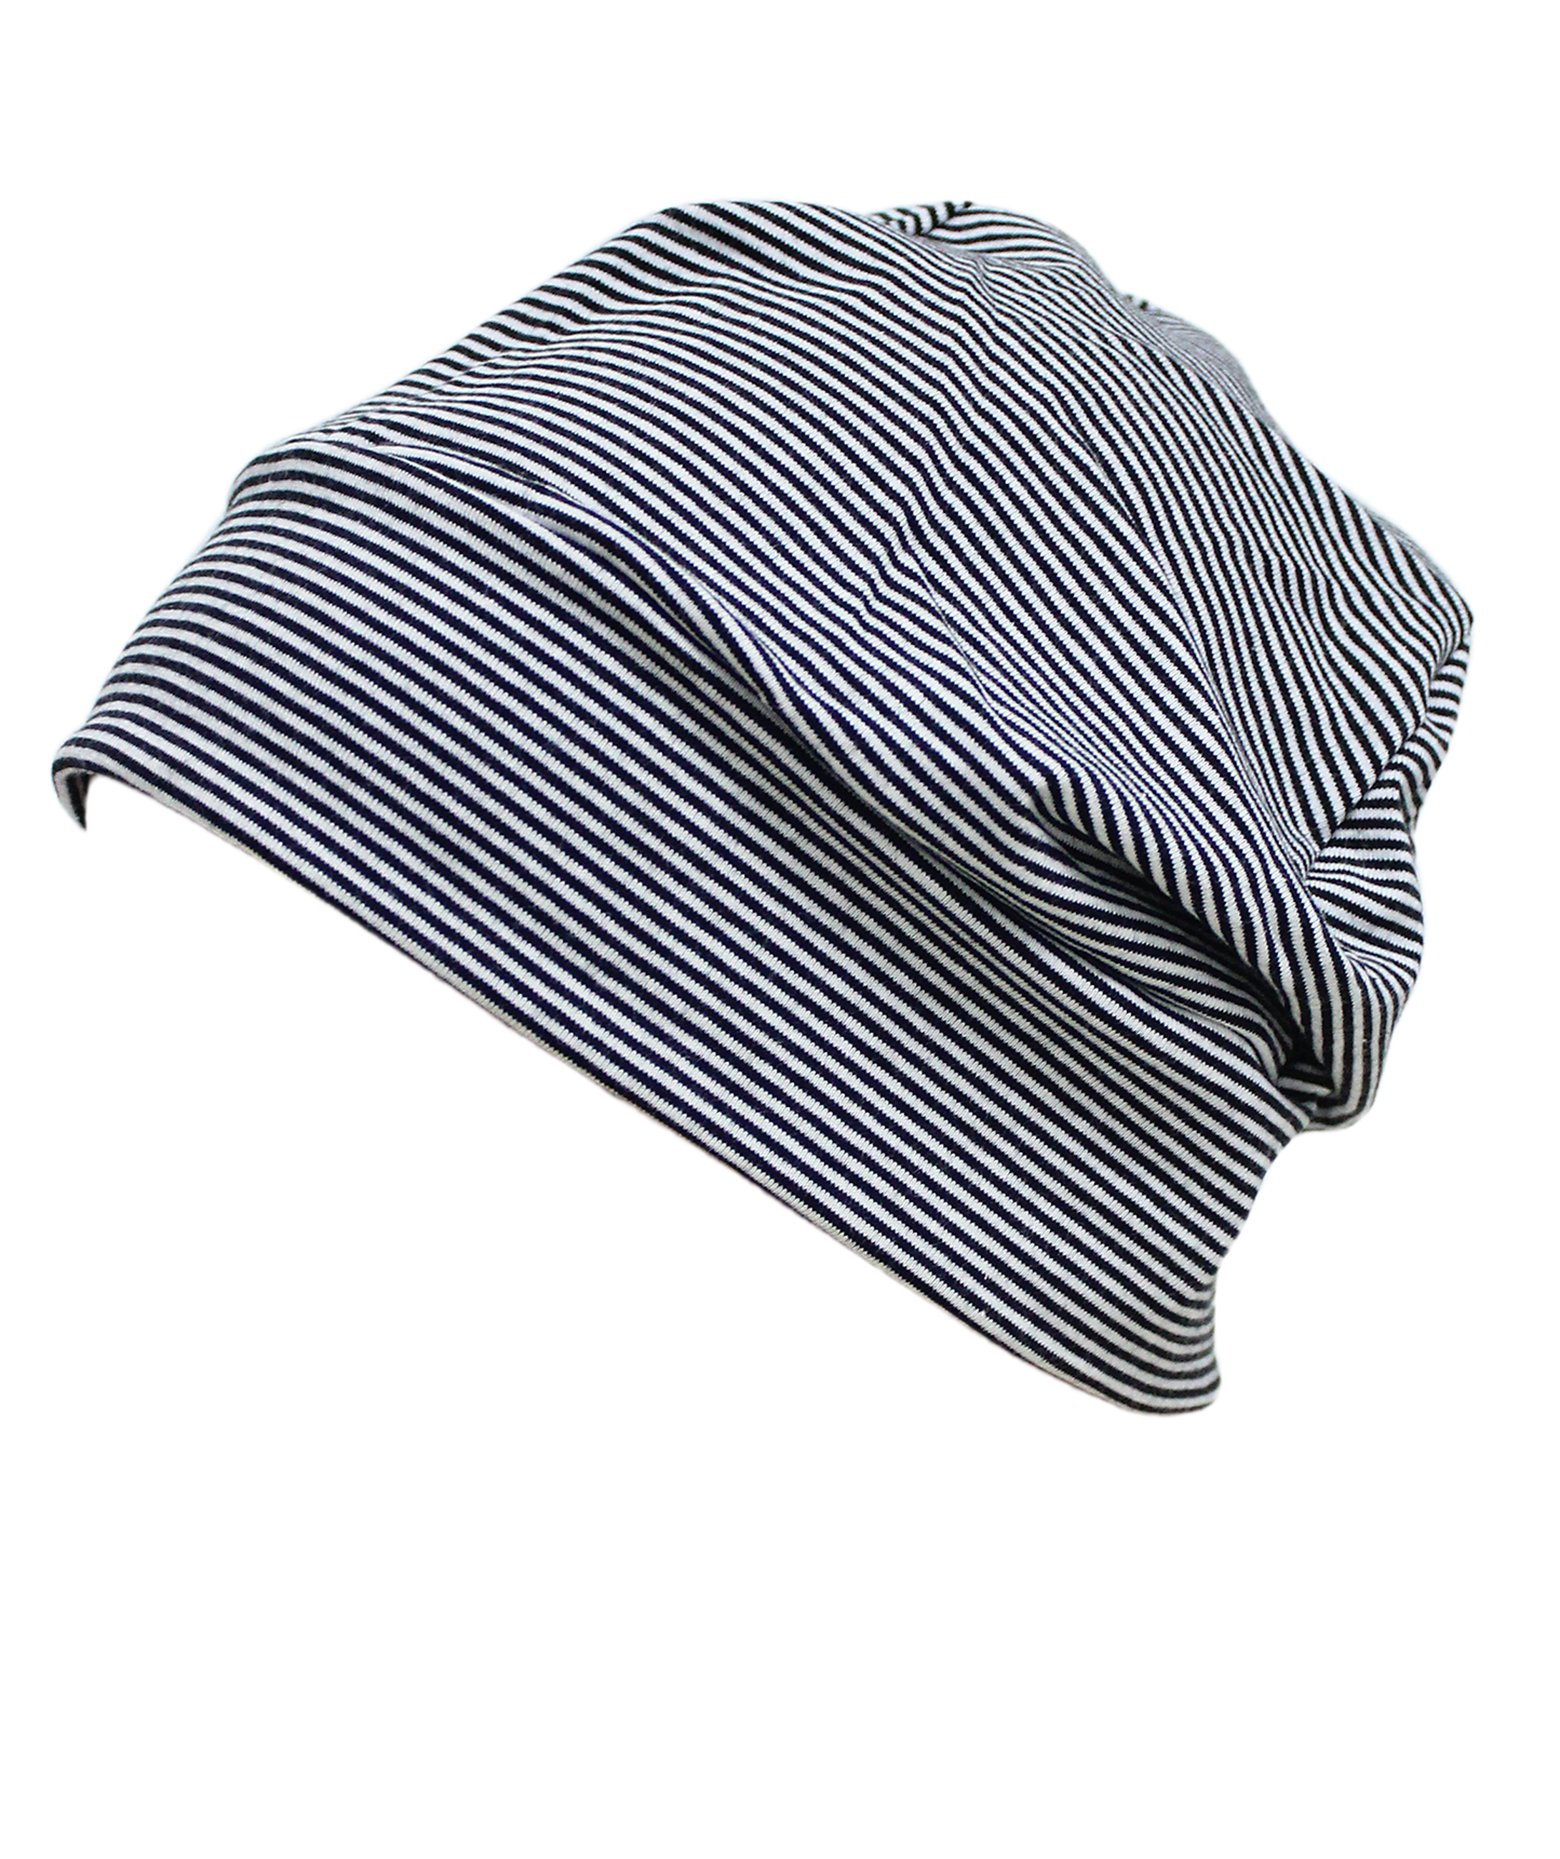 Firsthats Cotton Sleep Cap for Men - Sleeping Hat